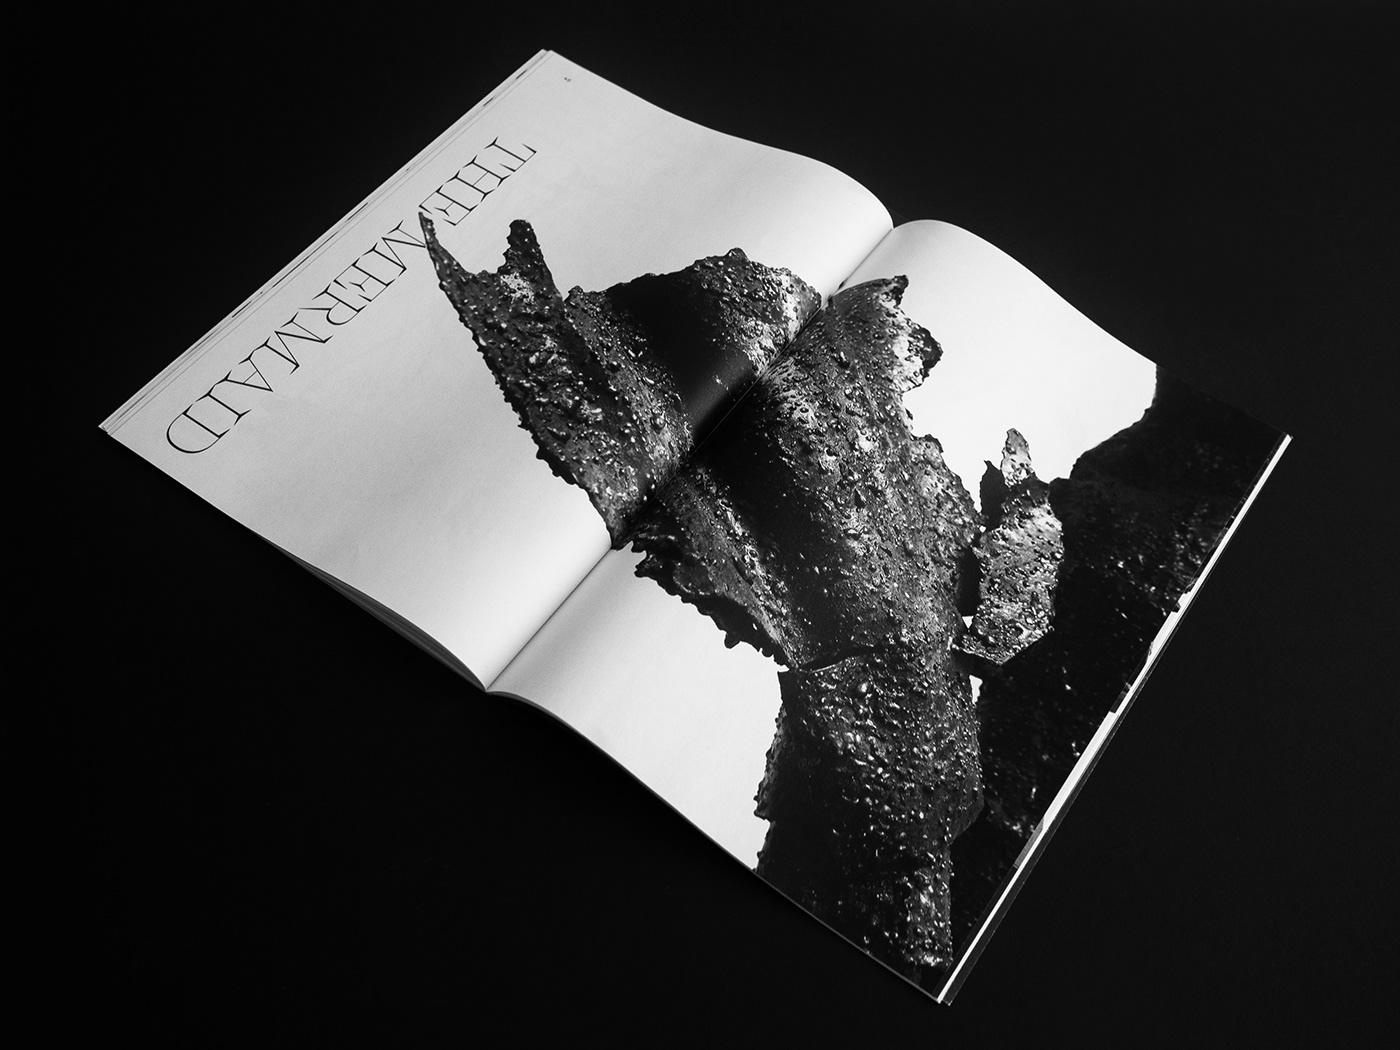 Booklet,catalog,editorial design ,sculpture,black and white,editorial,metal,portfolio,trend,brutal